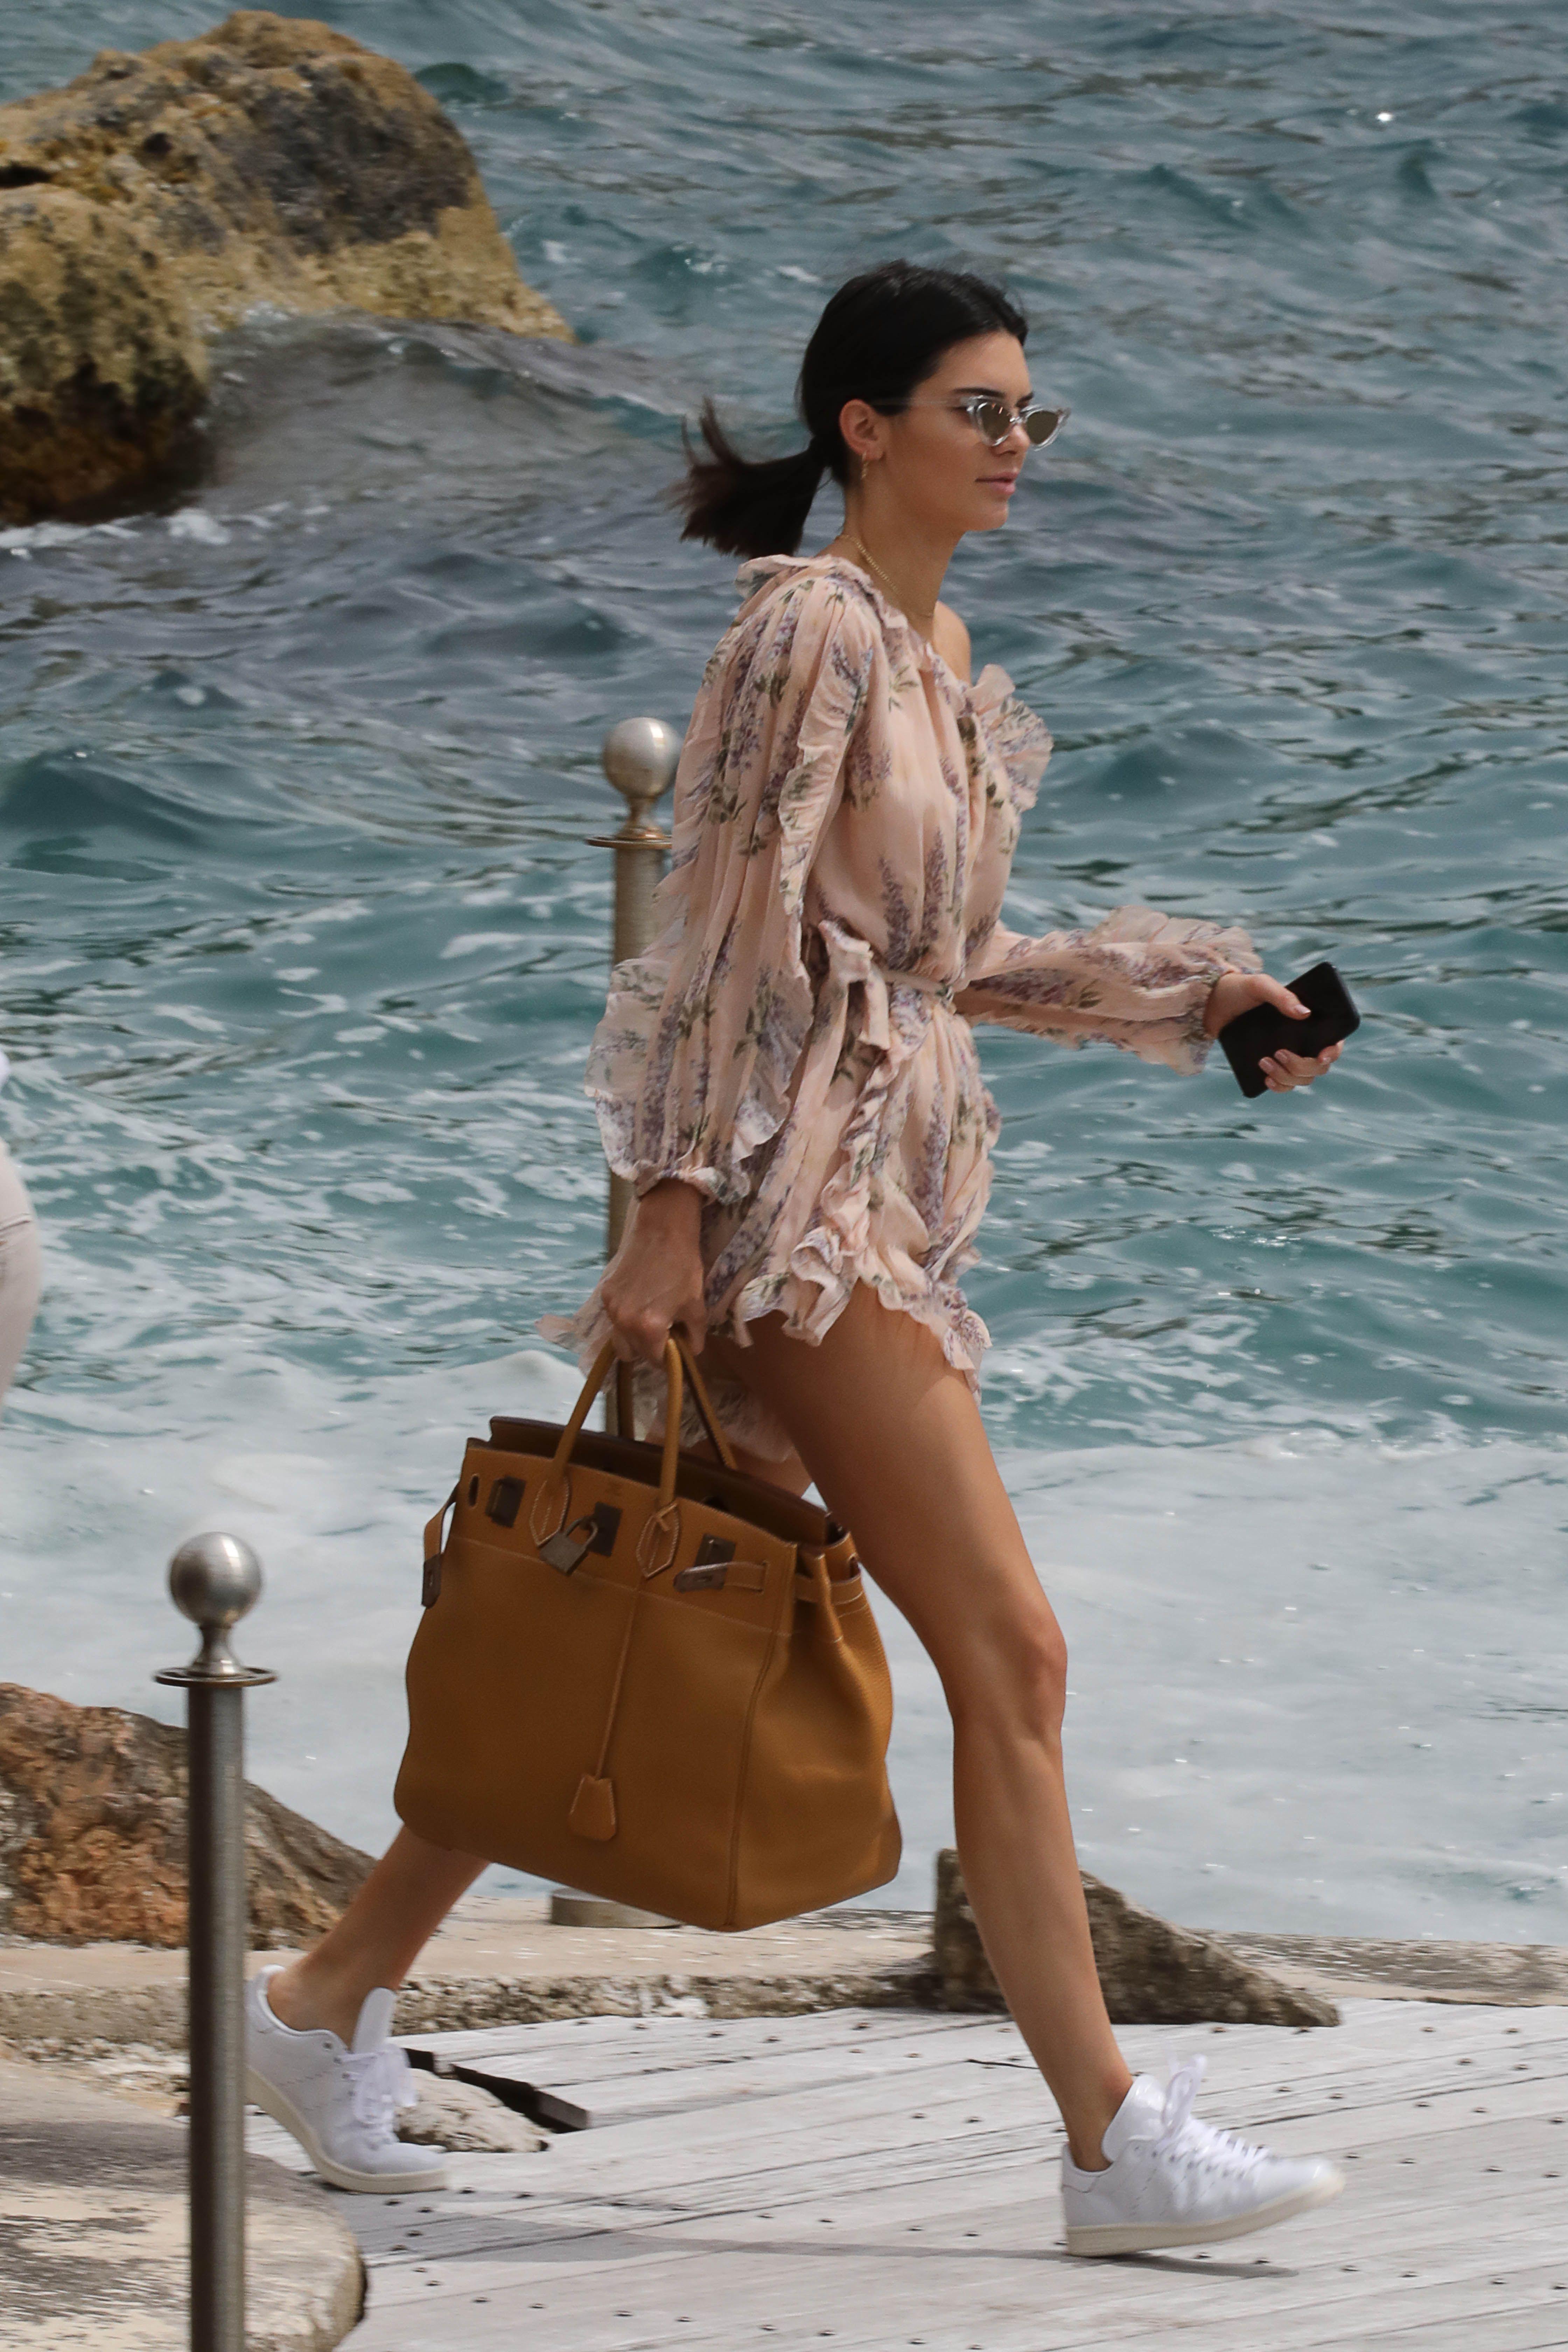 Kendall Jenner A flowy romper or shirt-dress is peak effortless summer dressing.